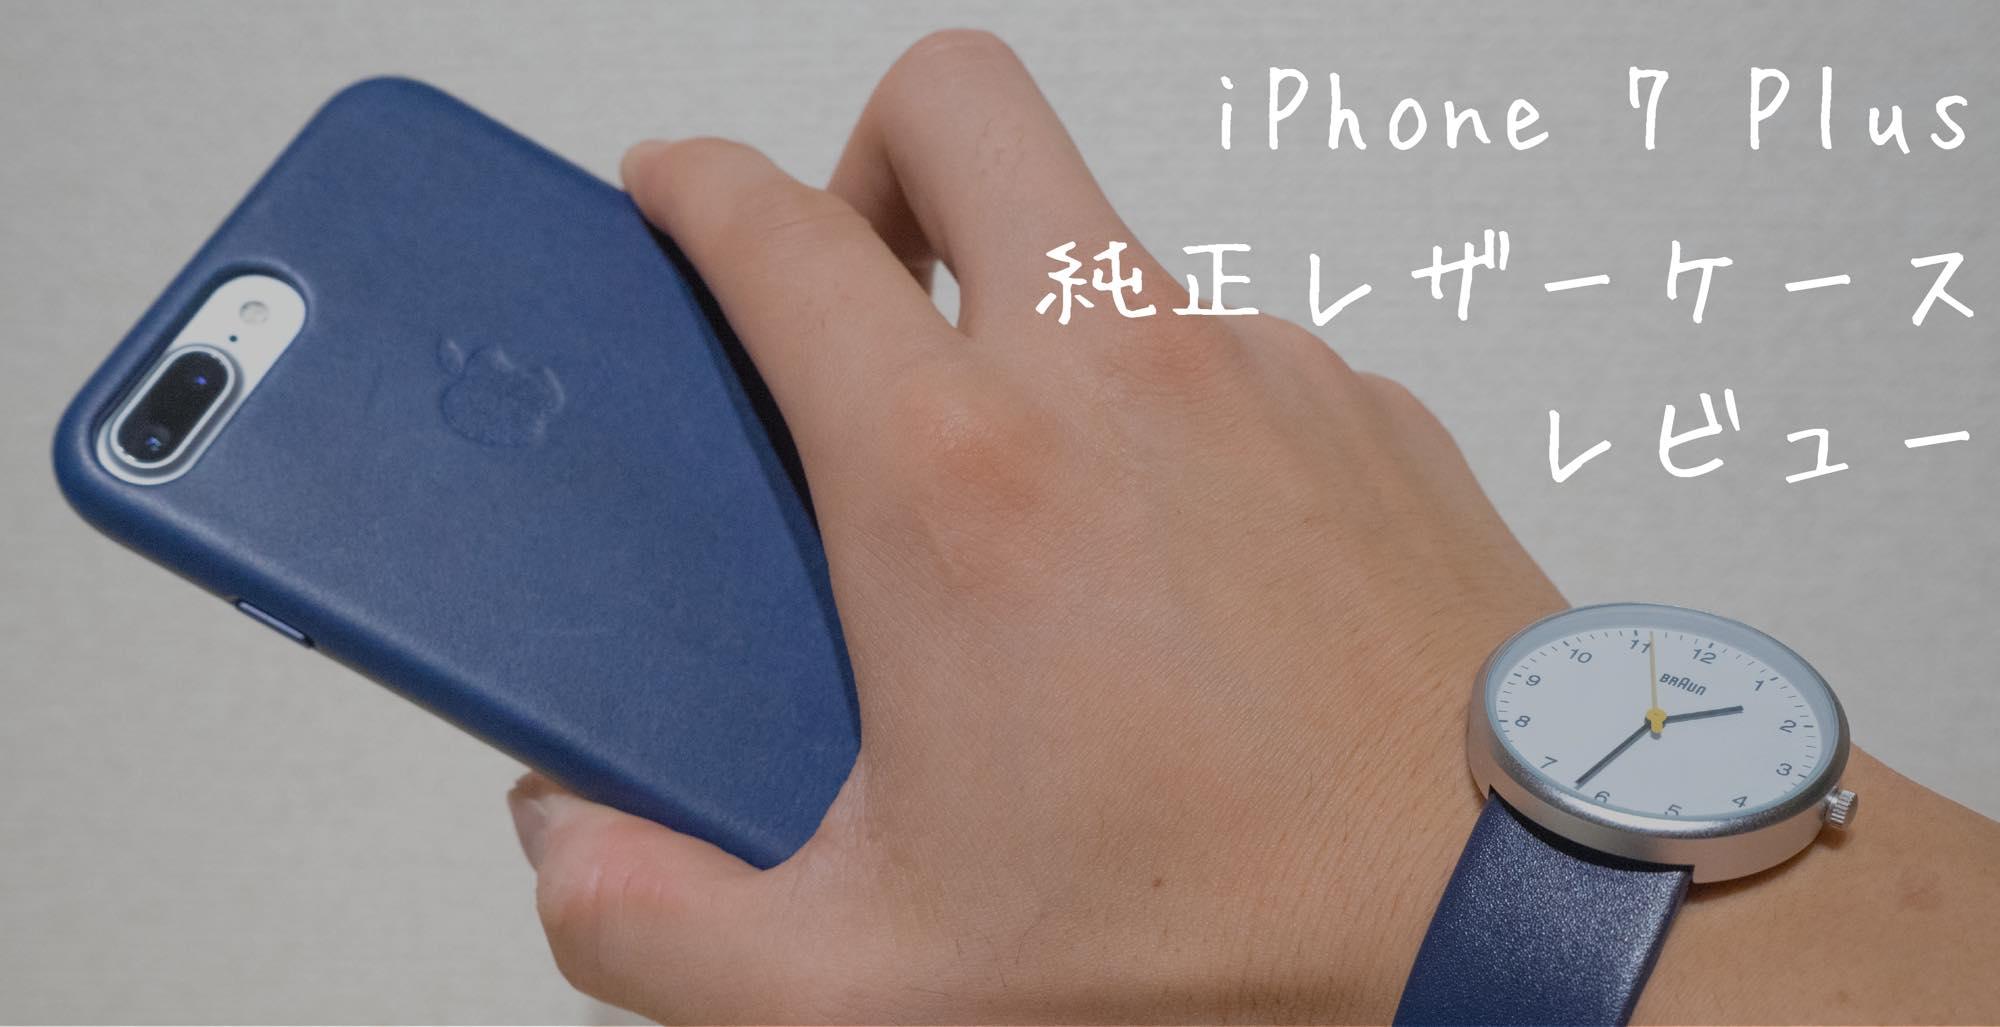 iphone7plus-leathercase-midnightblue18